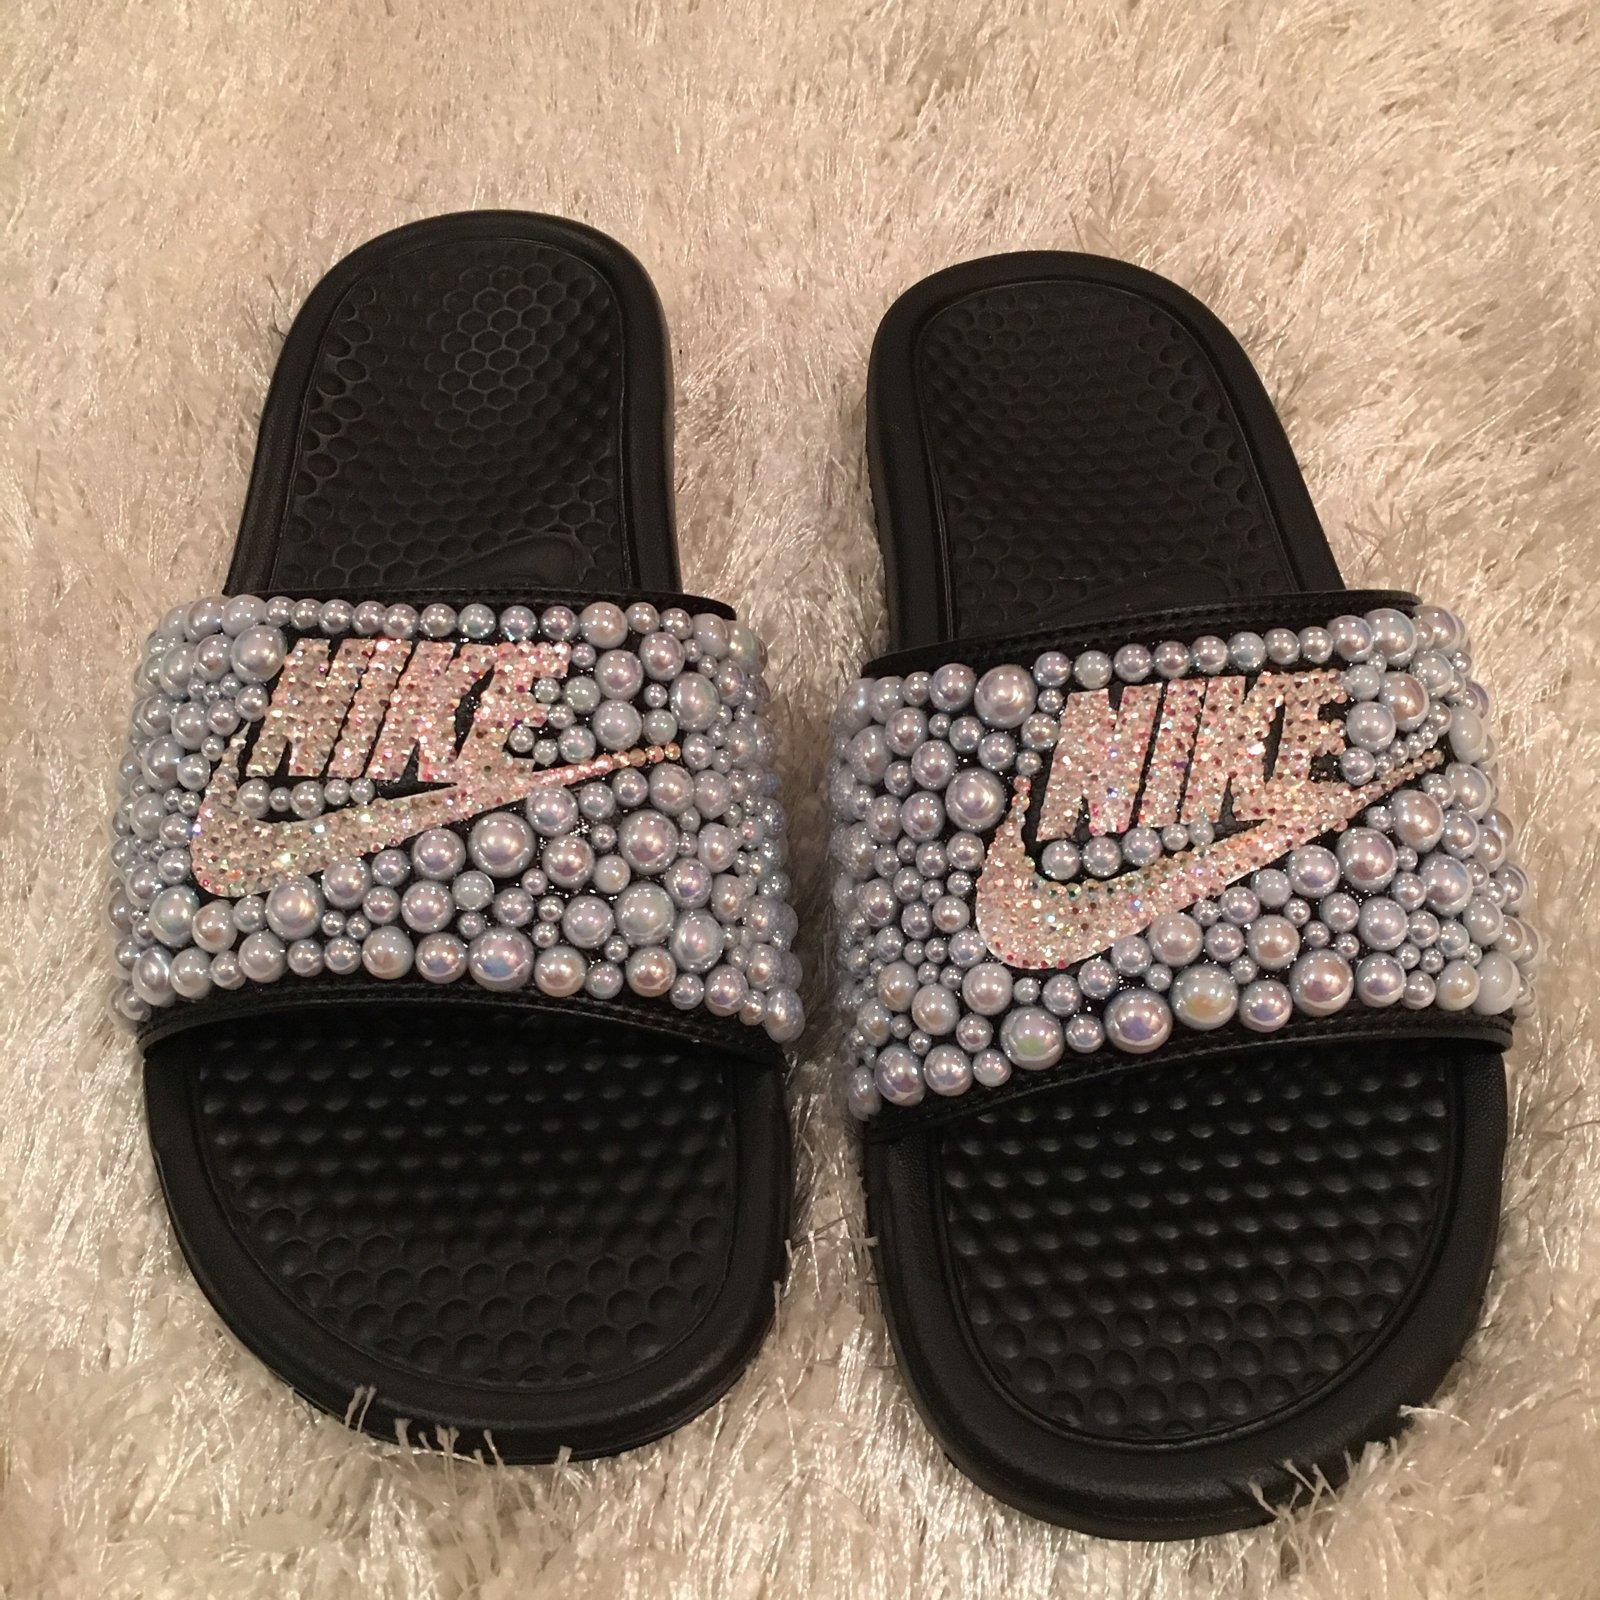 Iridescent Creationsbytm Swarovski Crystal Nike Pearl Custom Sandals 7wxfqf